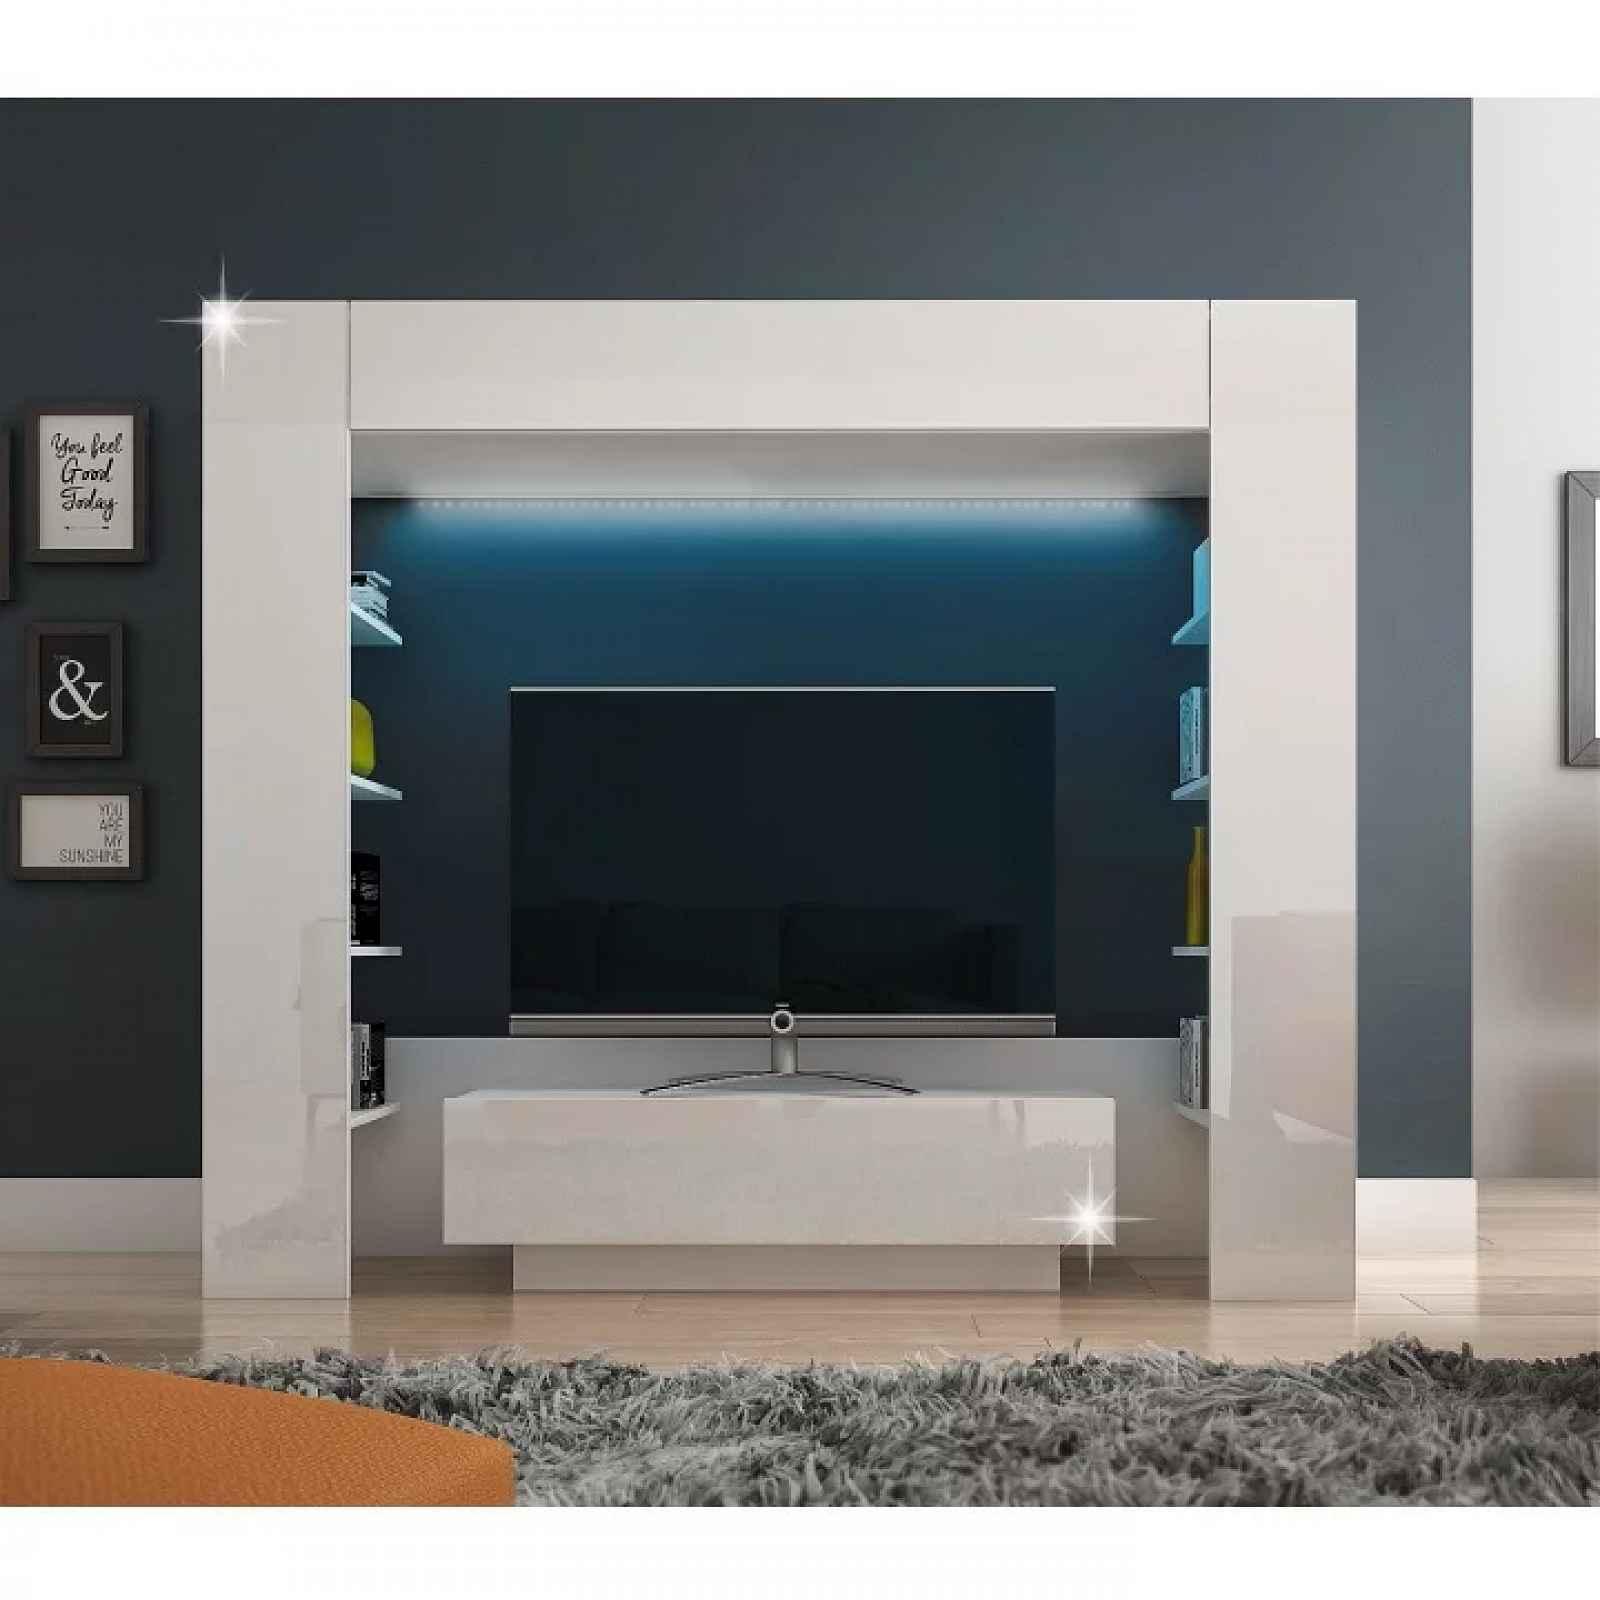 Luxusní TV a media stěna, bílá/bílá extra vysoký lesk, MONTEREJ 0000186841 Tempo Kondela